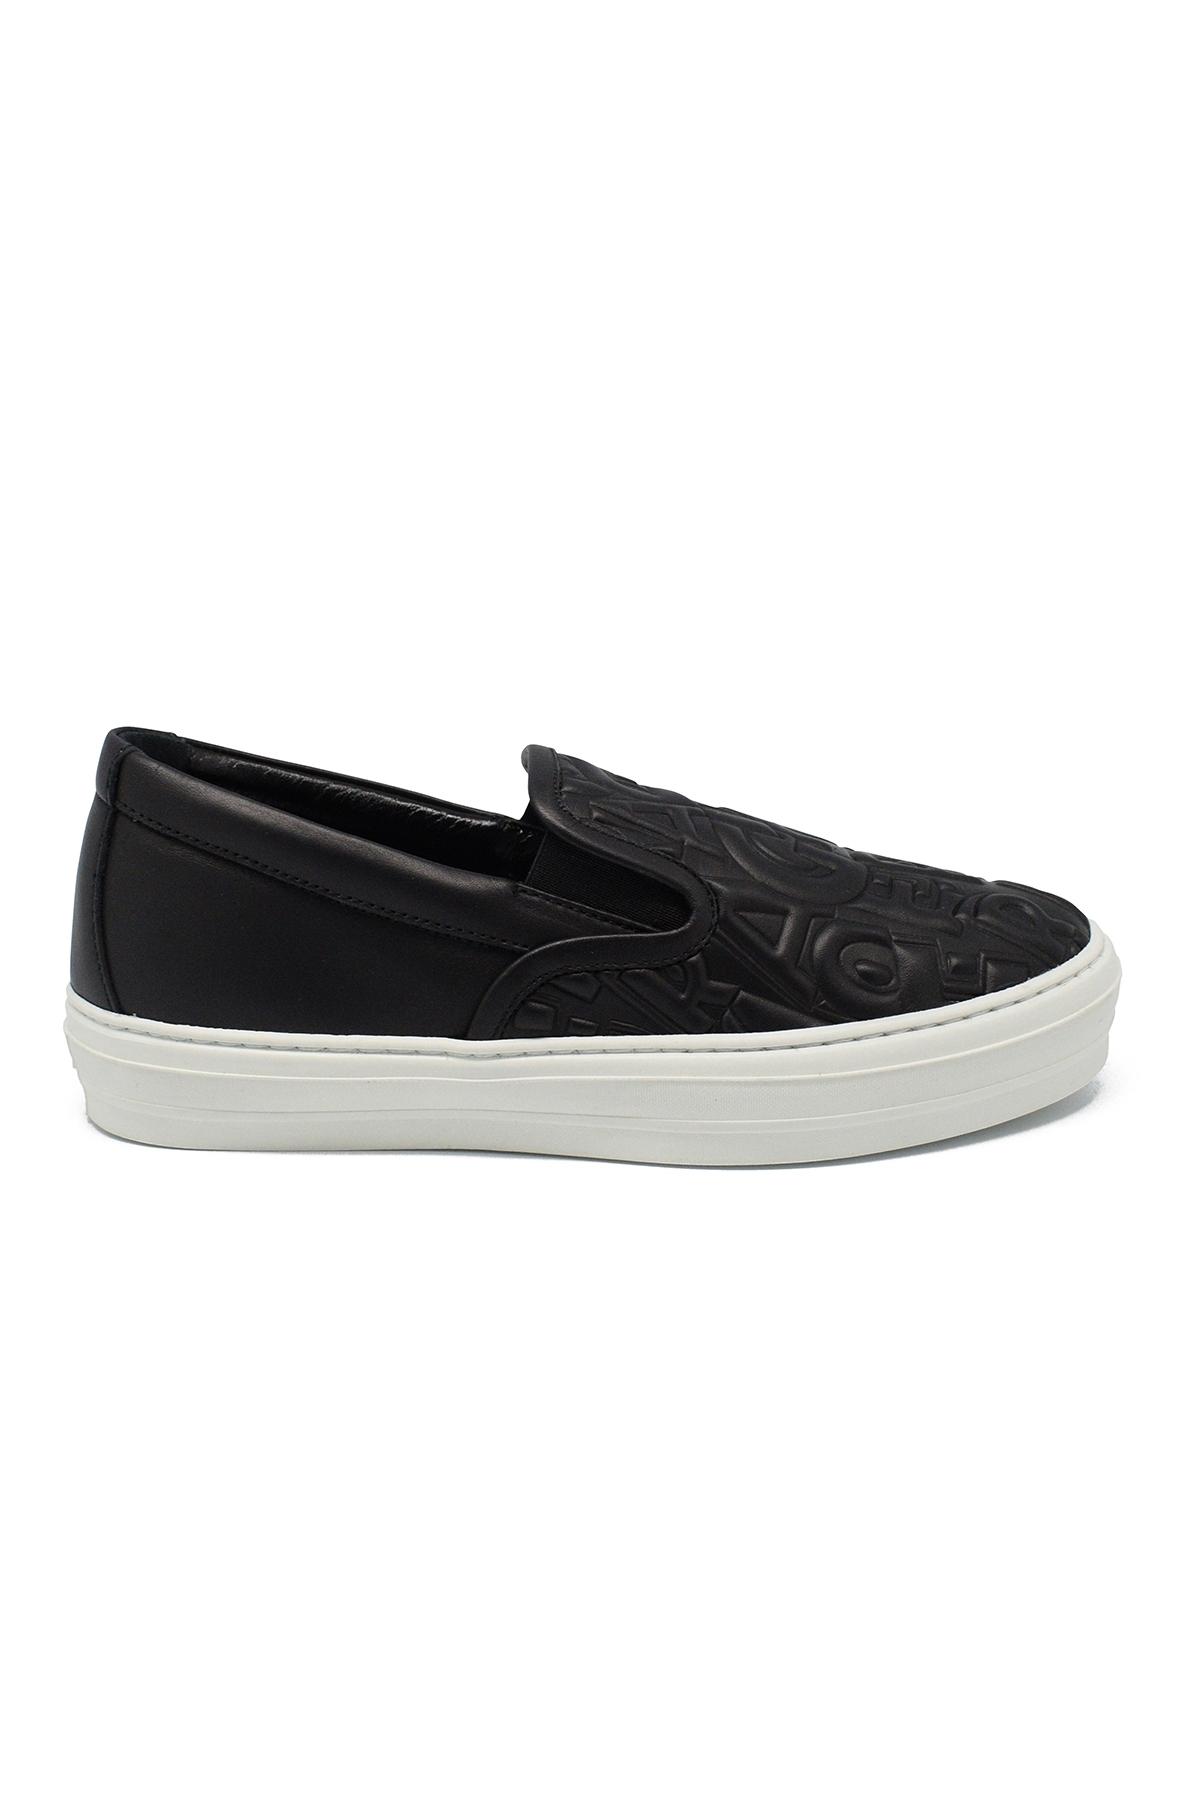 Leather slip-on